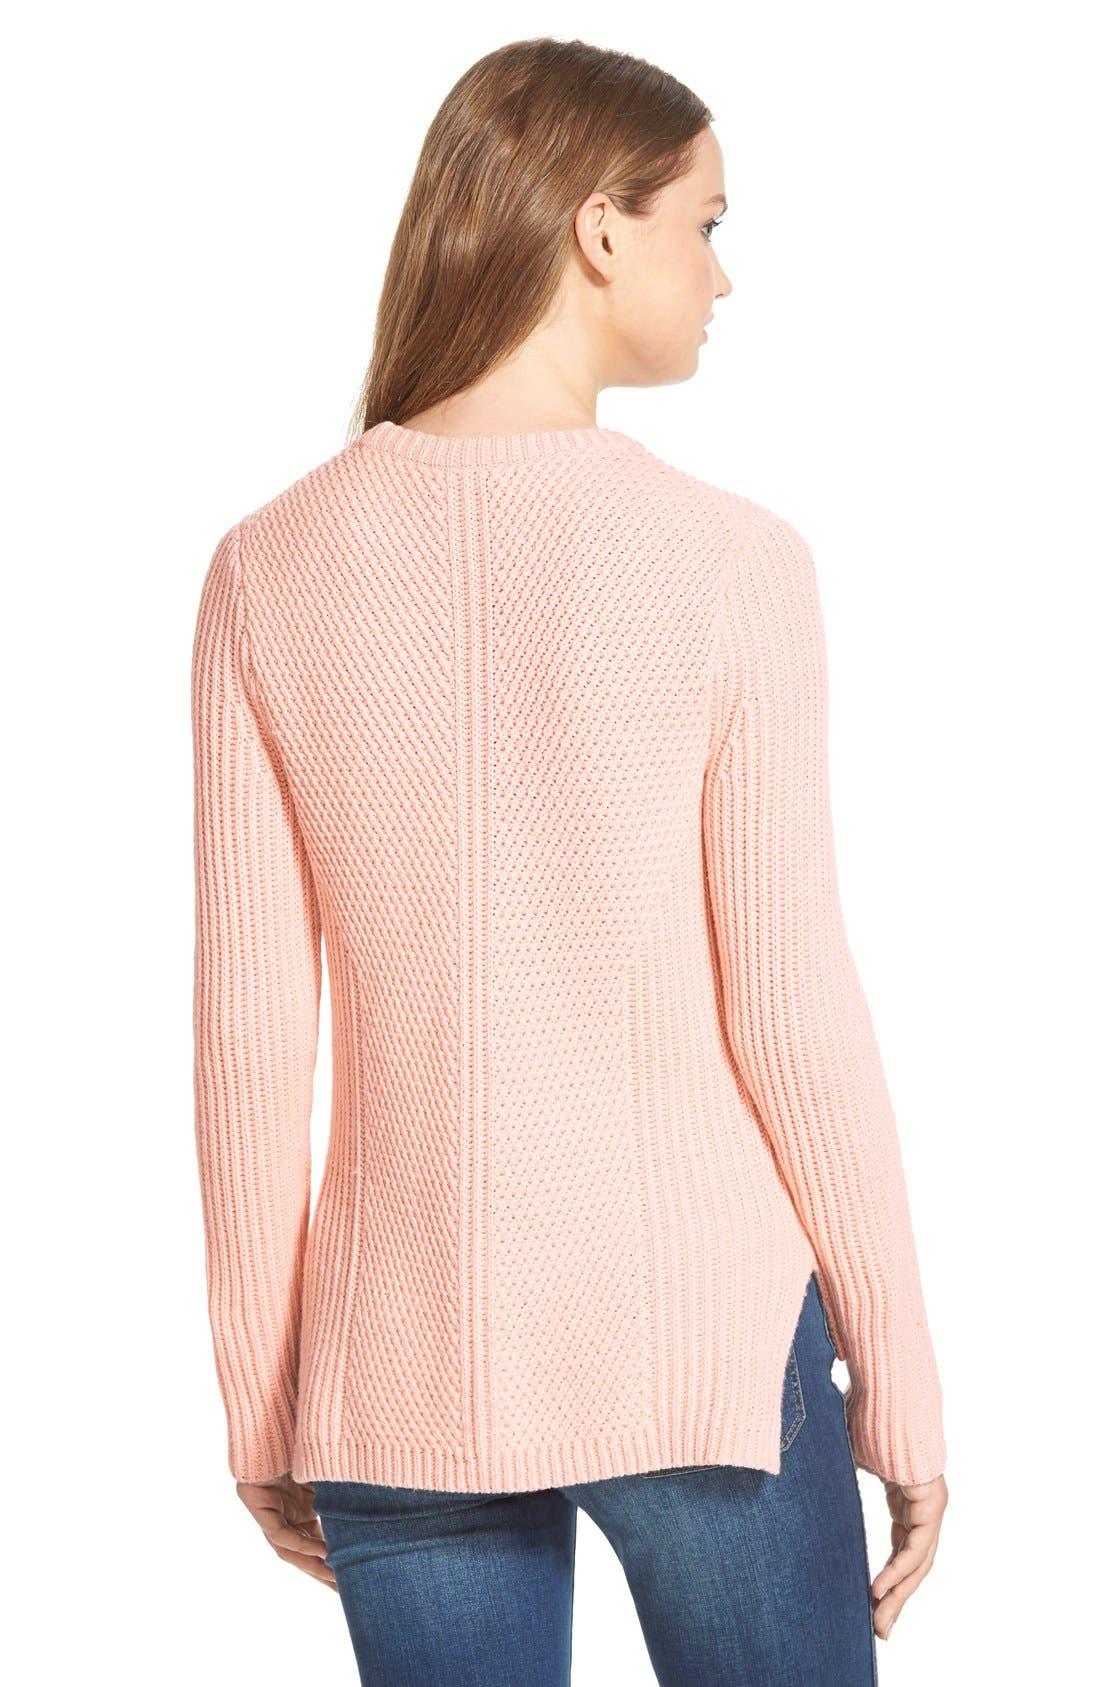 Alternate Image 2  - Madewell 'Holcomb' Texture Sweater